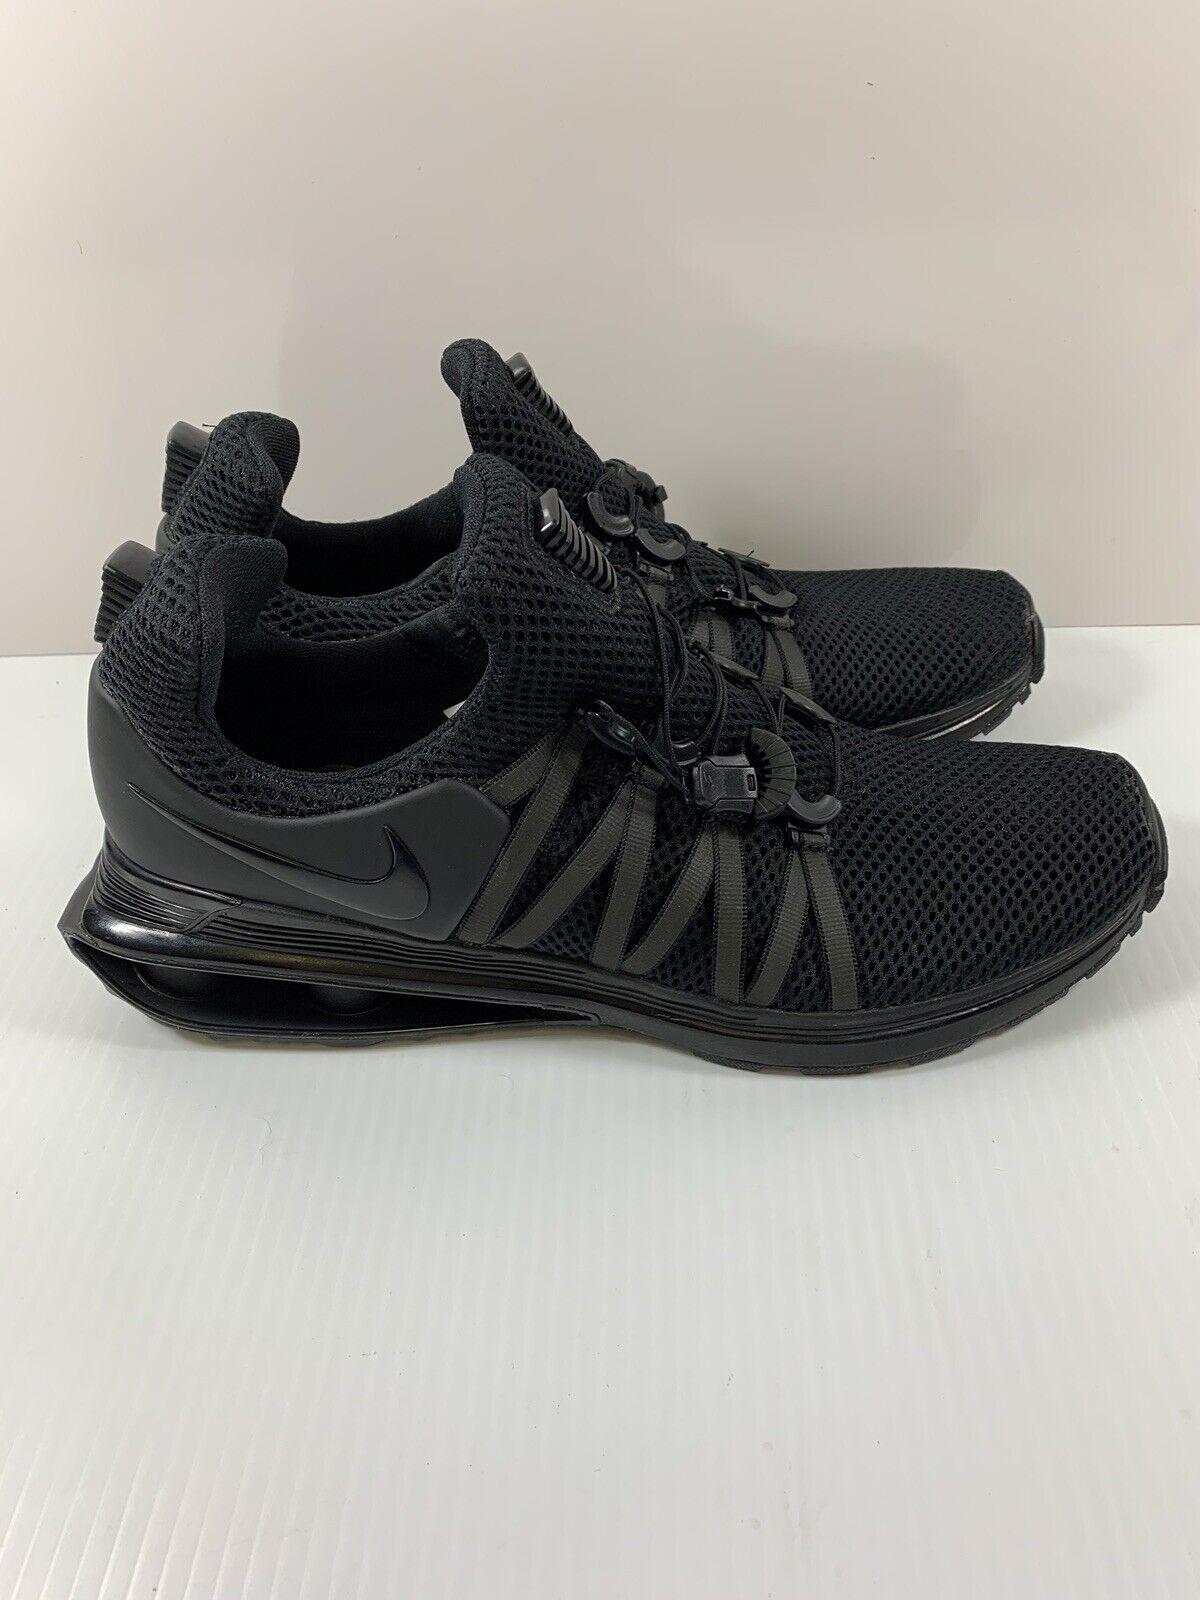 Nike Shox Gravity Men's shoes  Black AR1999 001 Size 8.5 Triple Black NEW